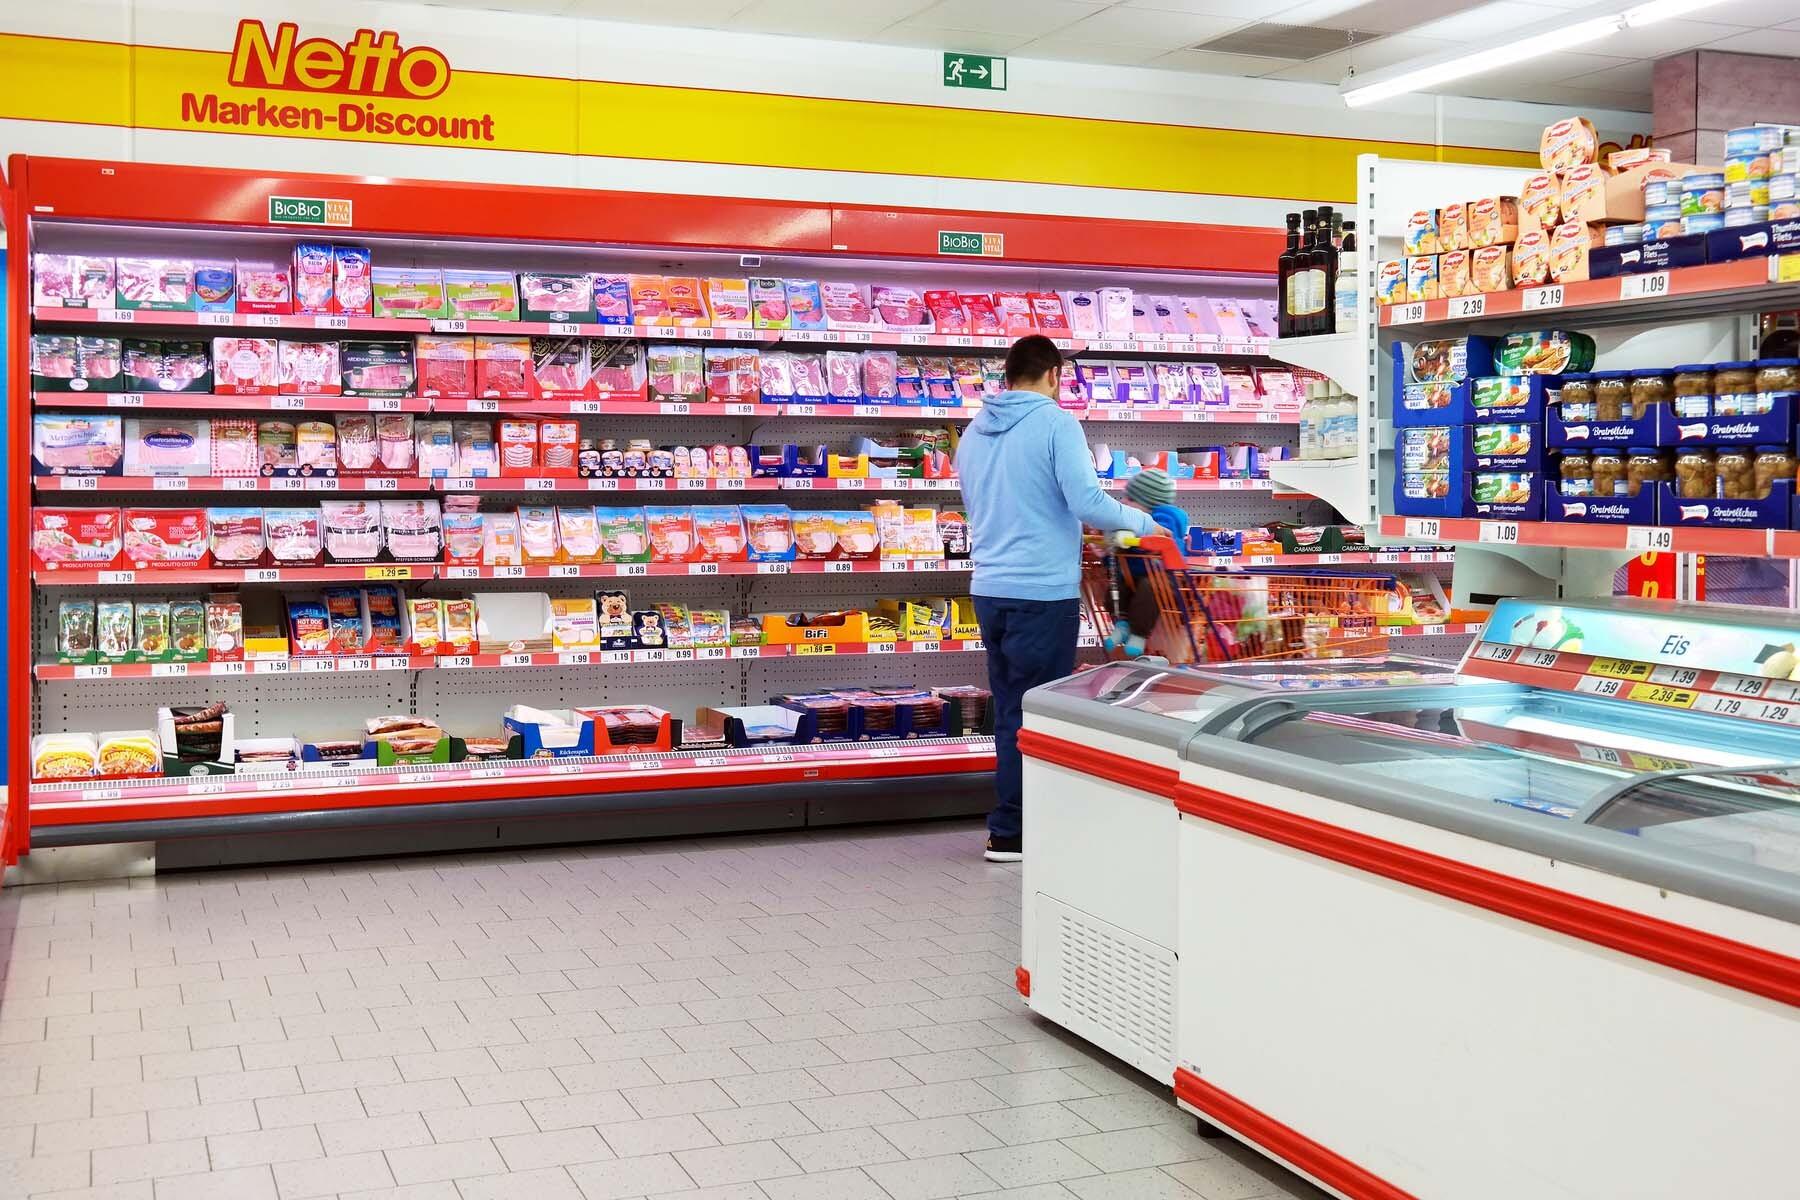 netto supermarkets germany